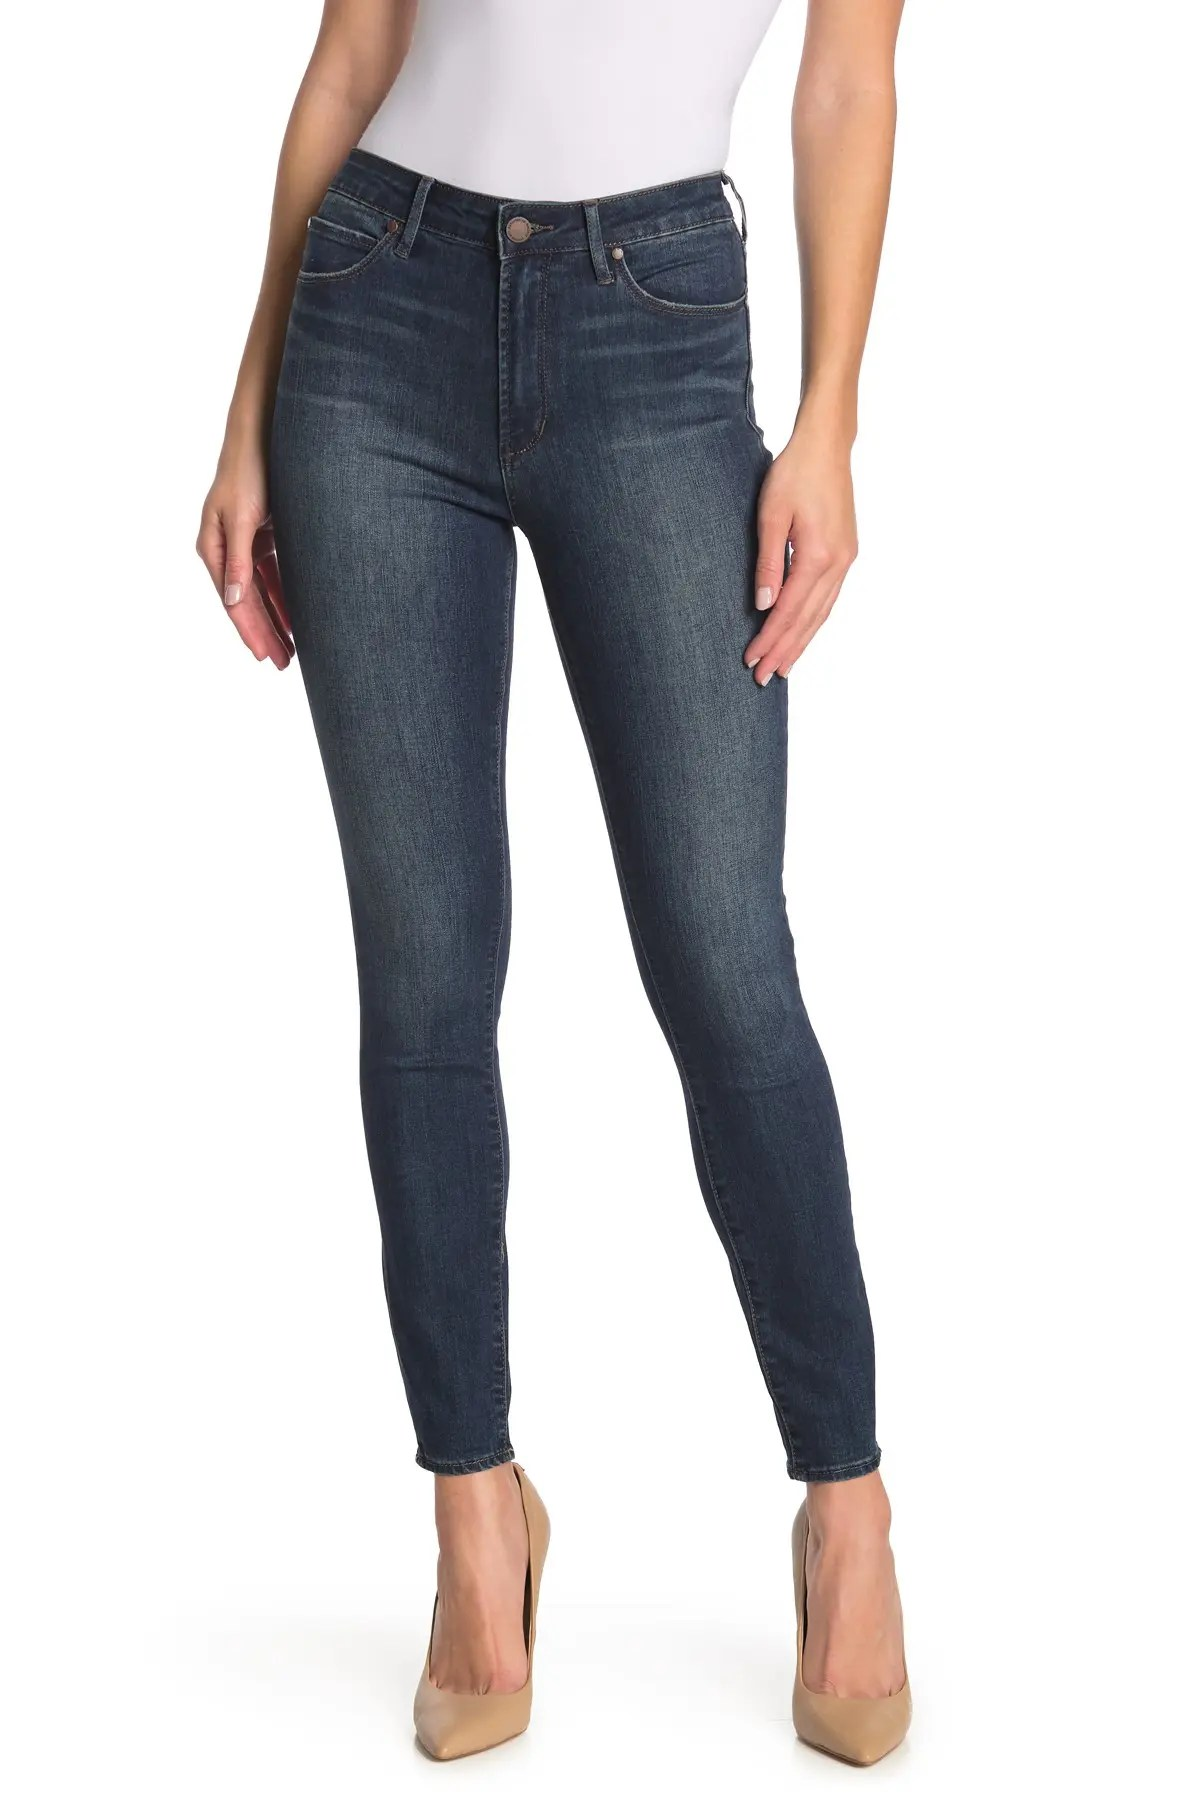 jeans denim clearance nordstrom rack